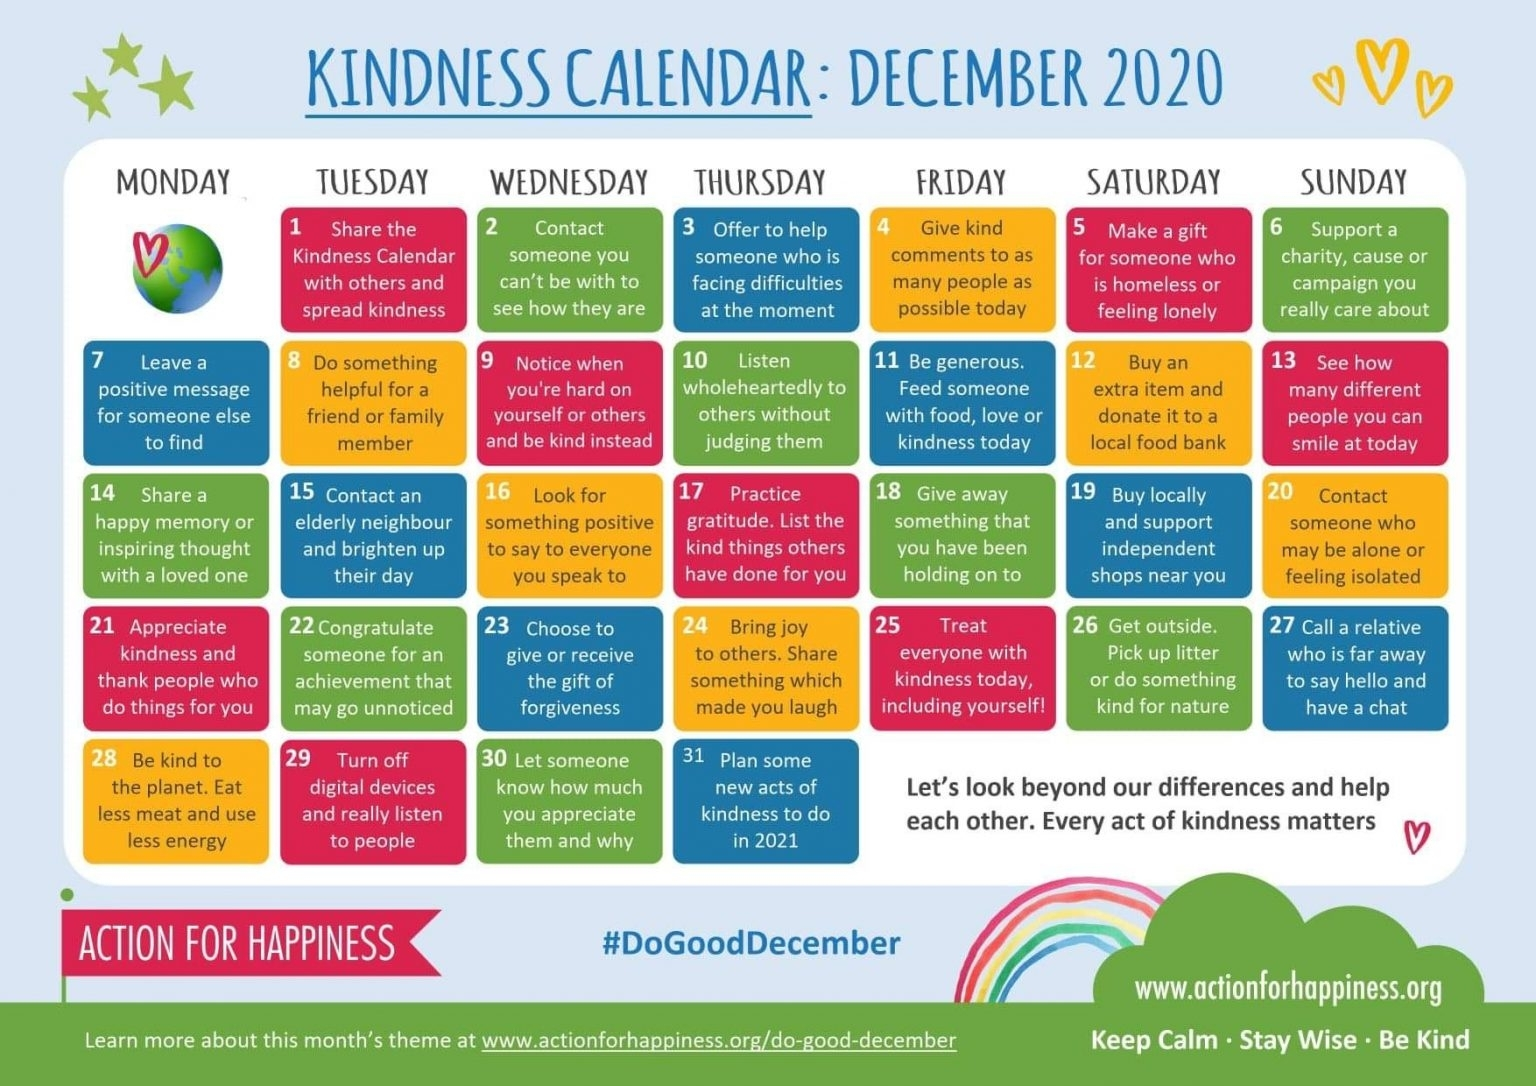 Kindness Calendar: December 2020 - Southfields Primary School